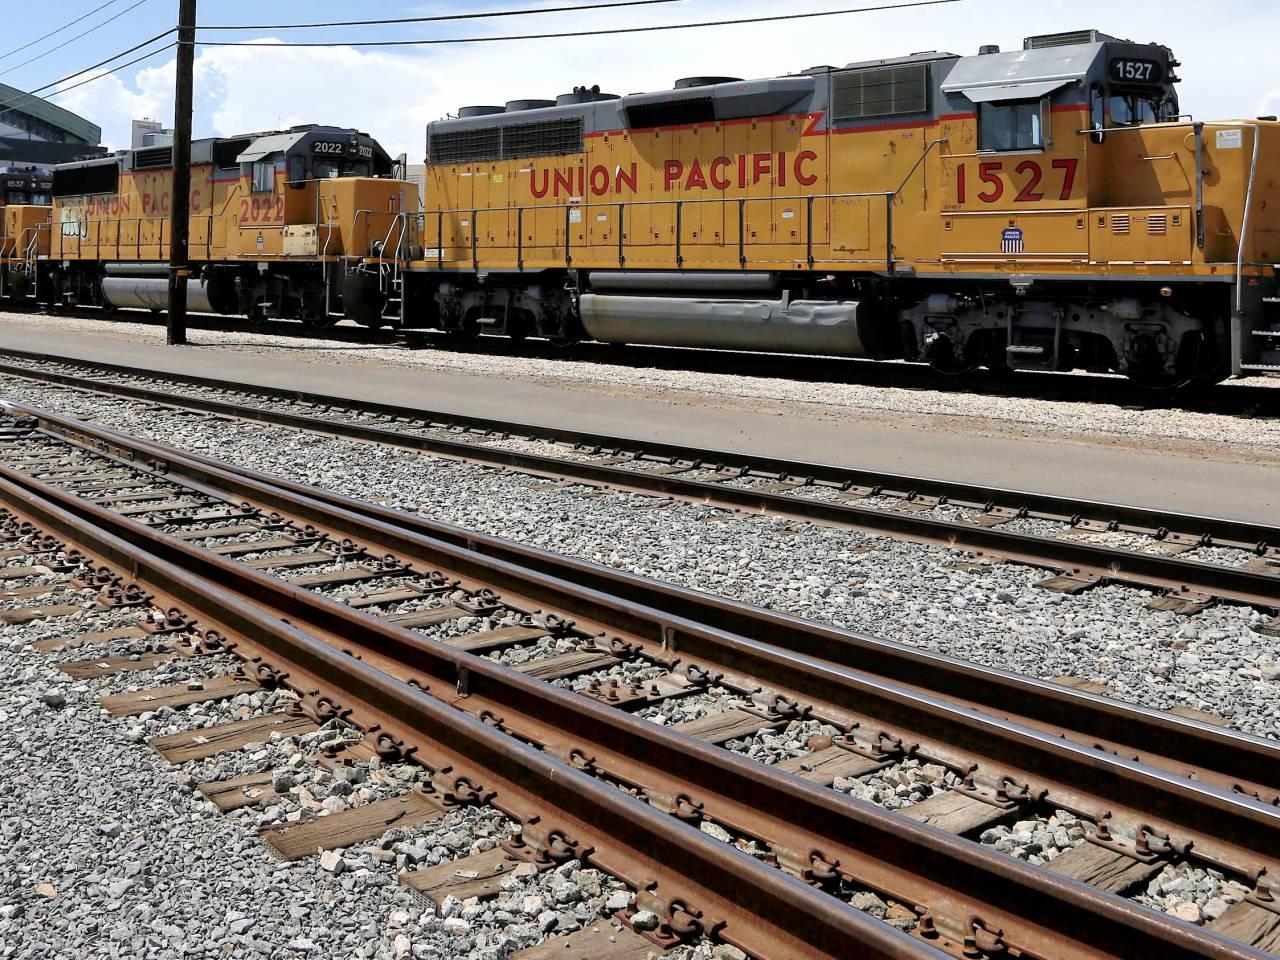 Union Pacific 3Q profit falls 13 percent as shipments slow - Salon.com